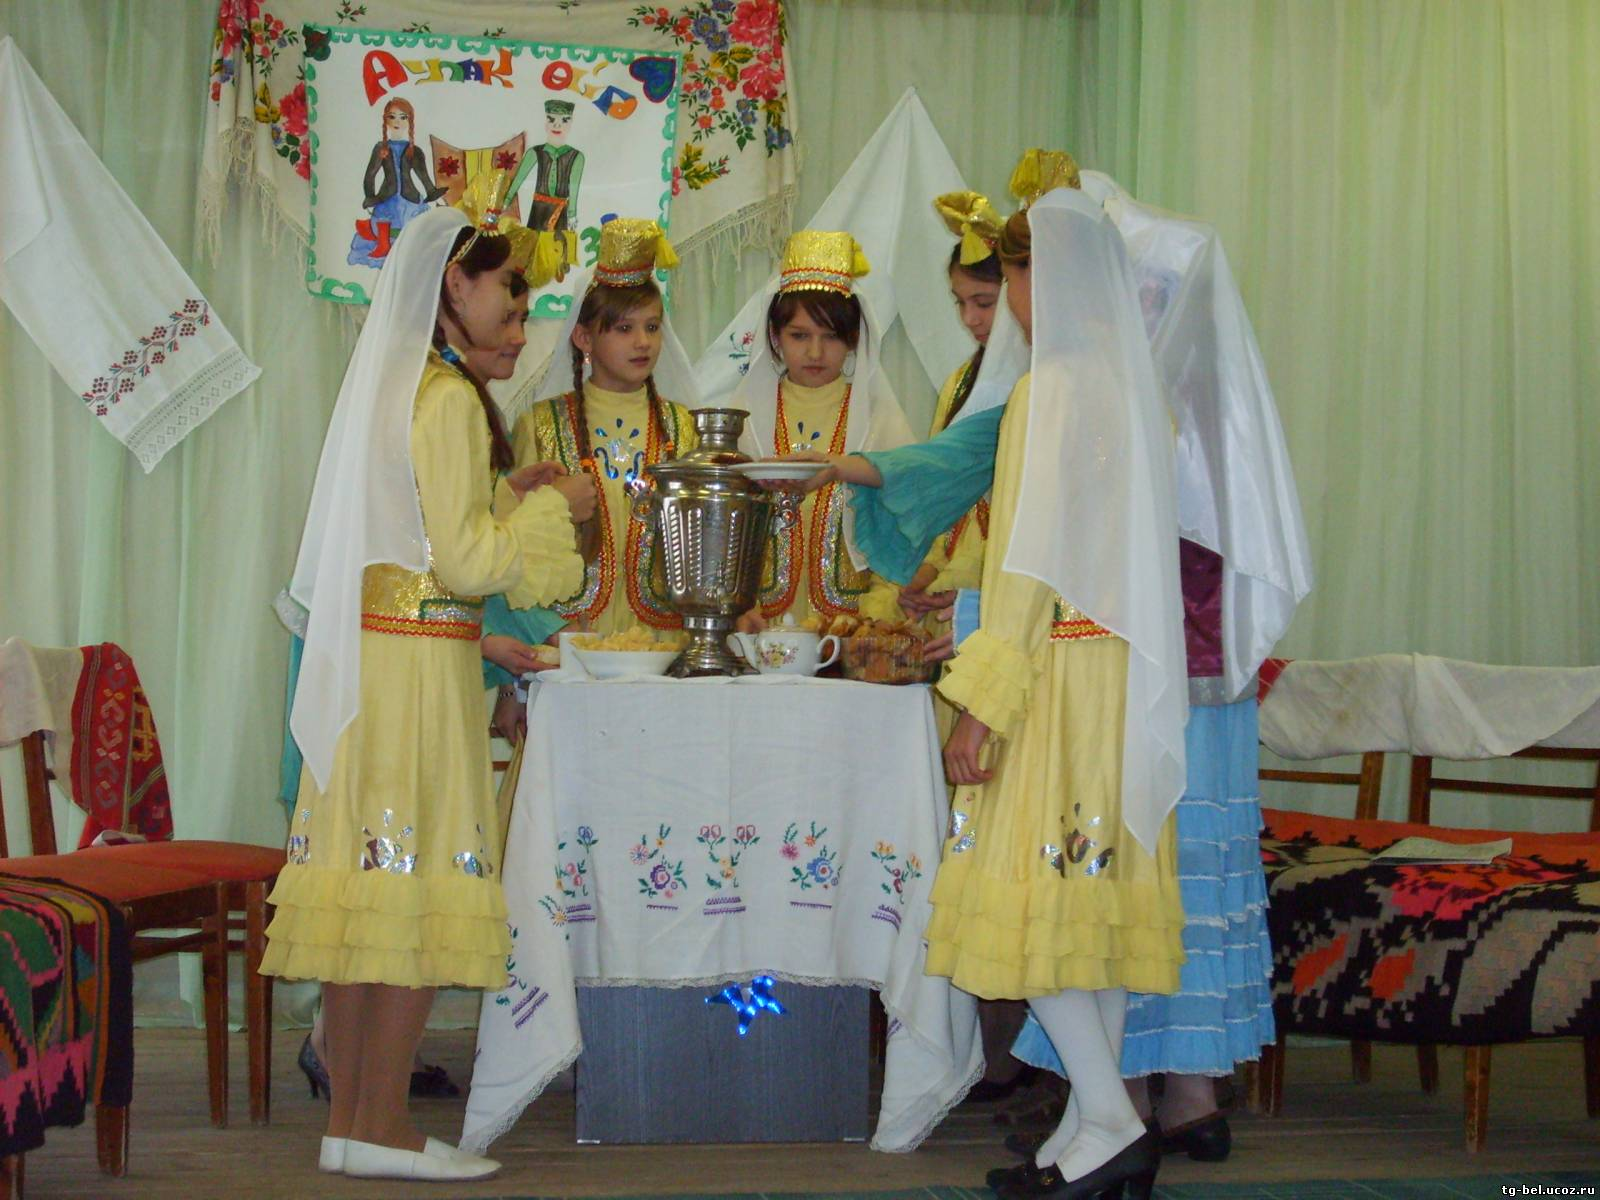 http://tg-bel.ucoz.ru/_ph/8/817840840.jpg